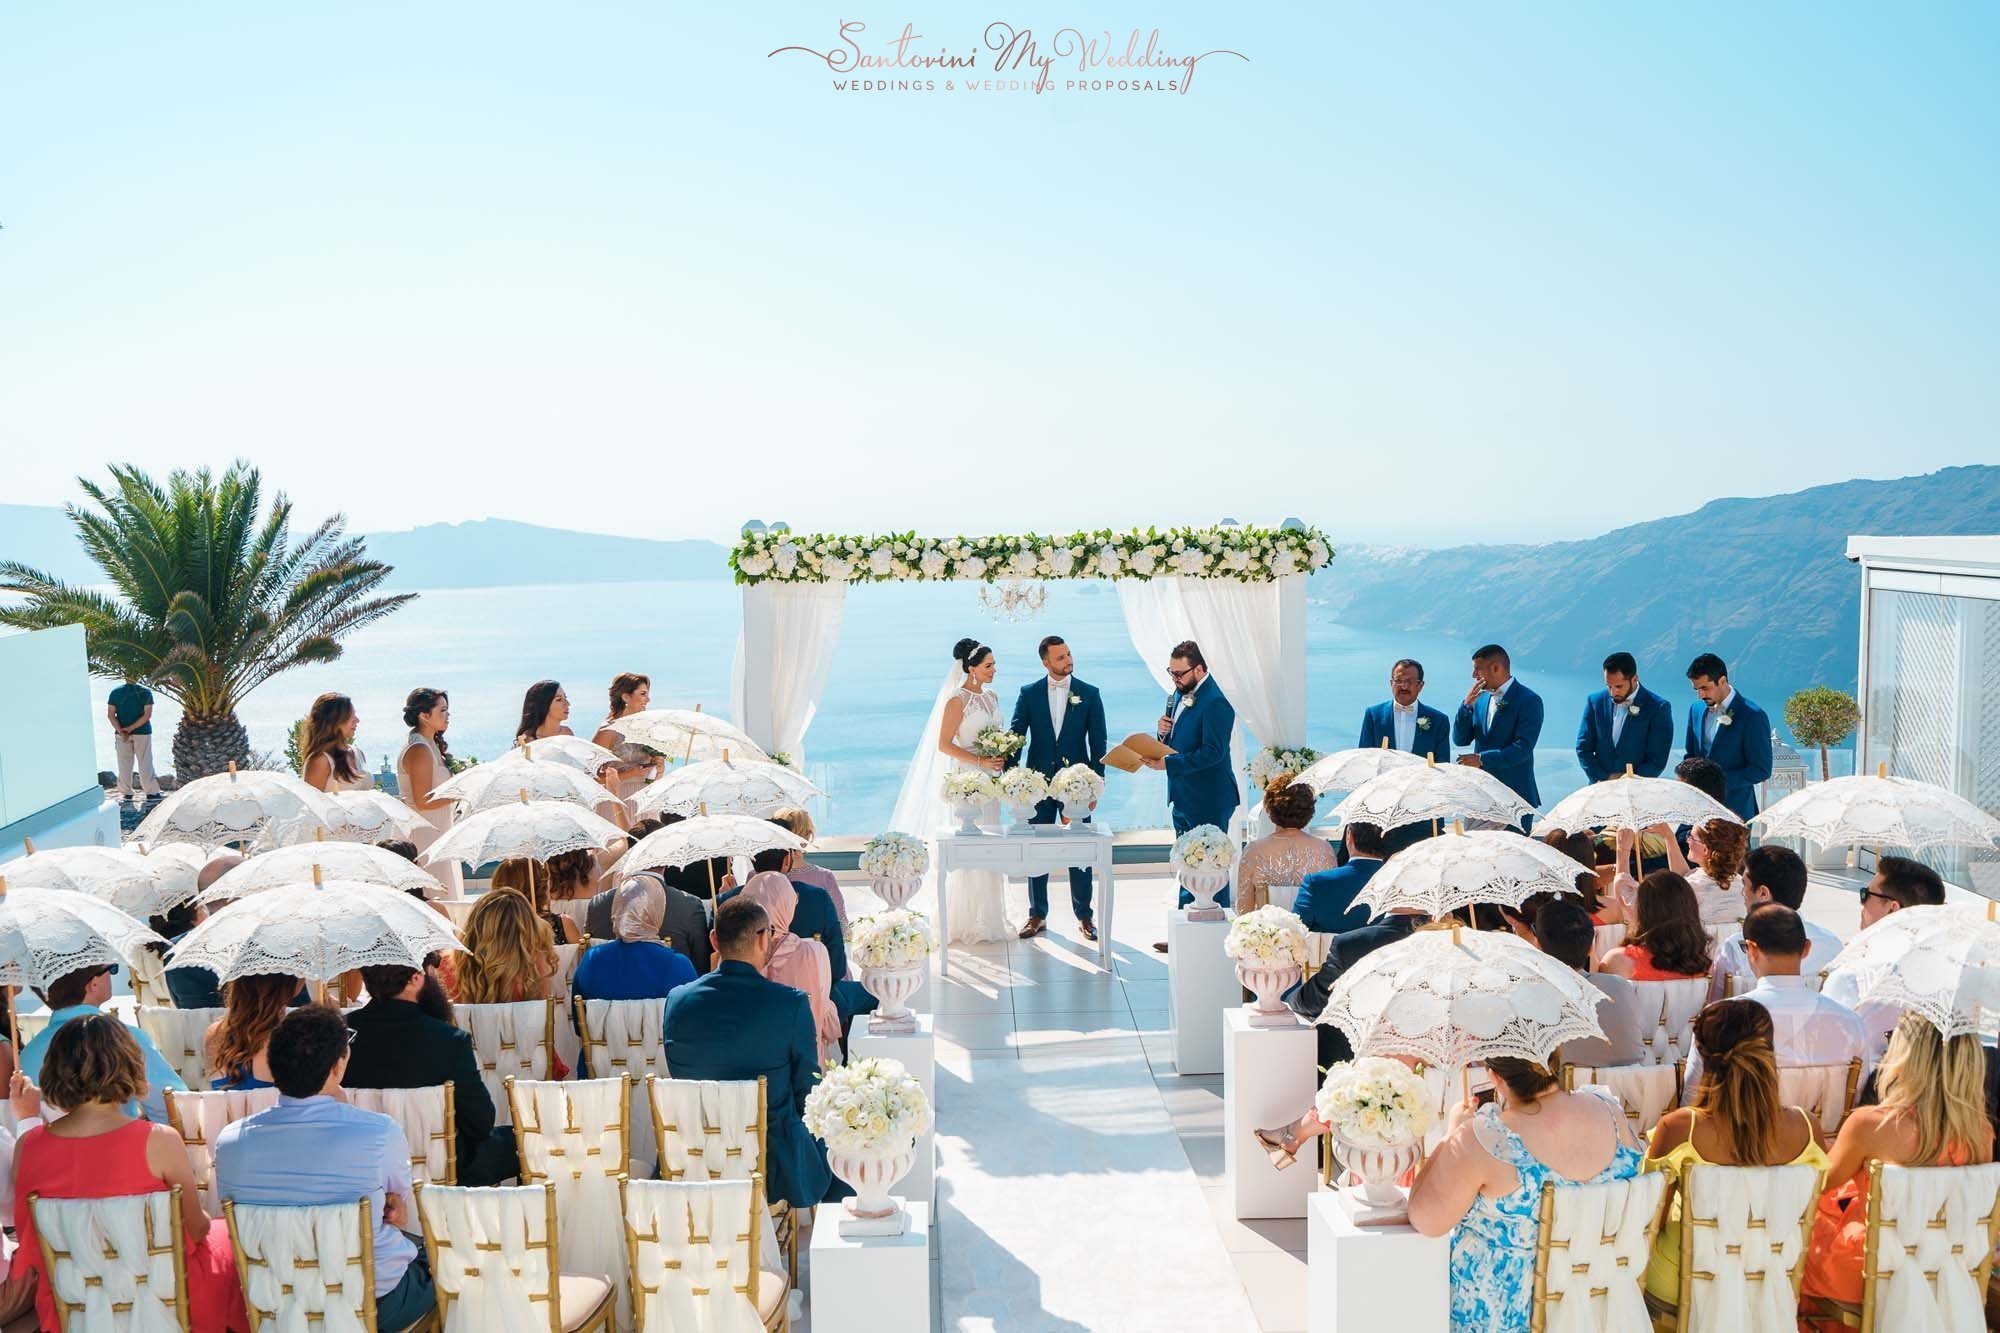 Le Ciel | Le Ciel santorini wedding cost